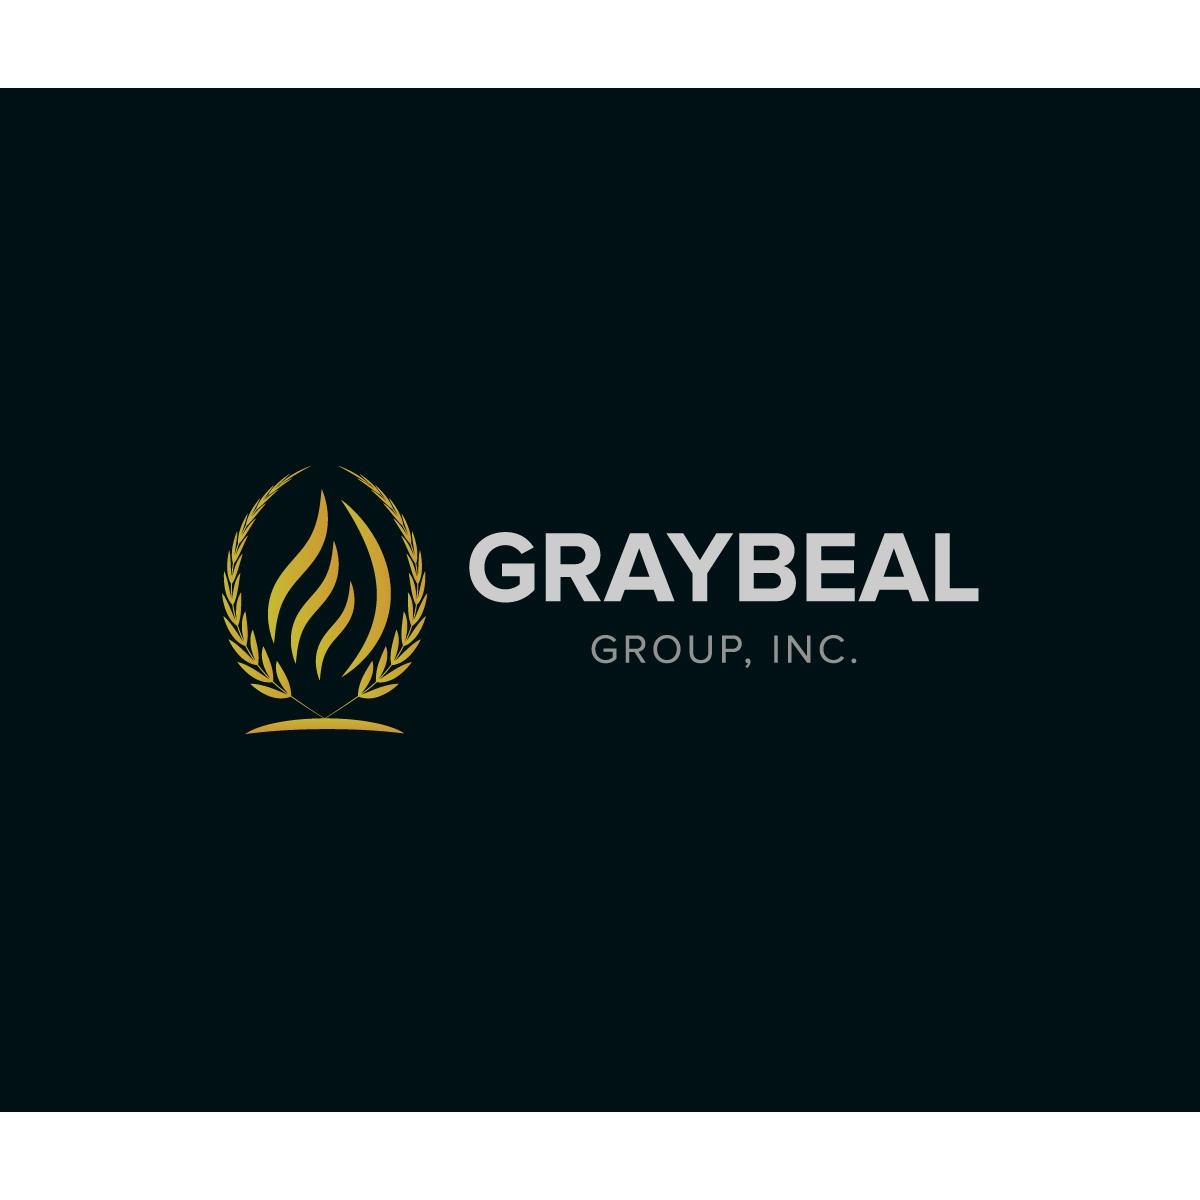 Graybeal Group - Consumer Insurance